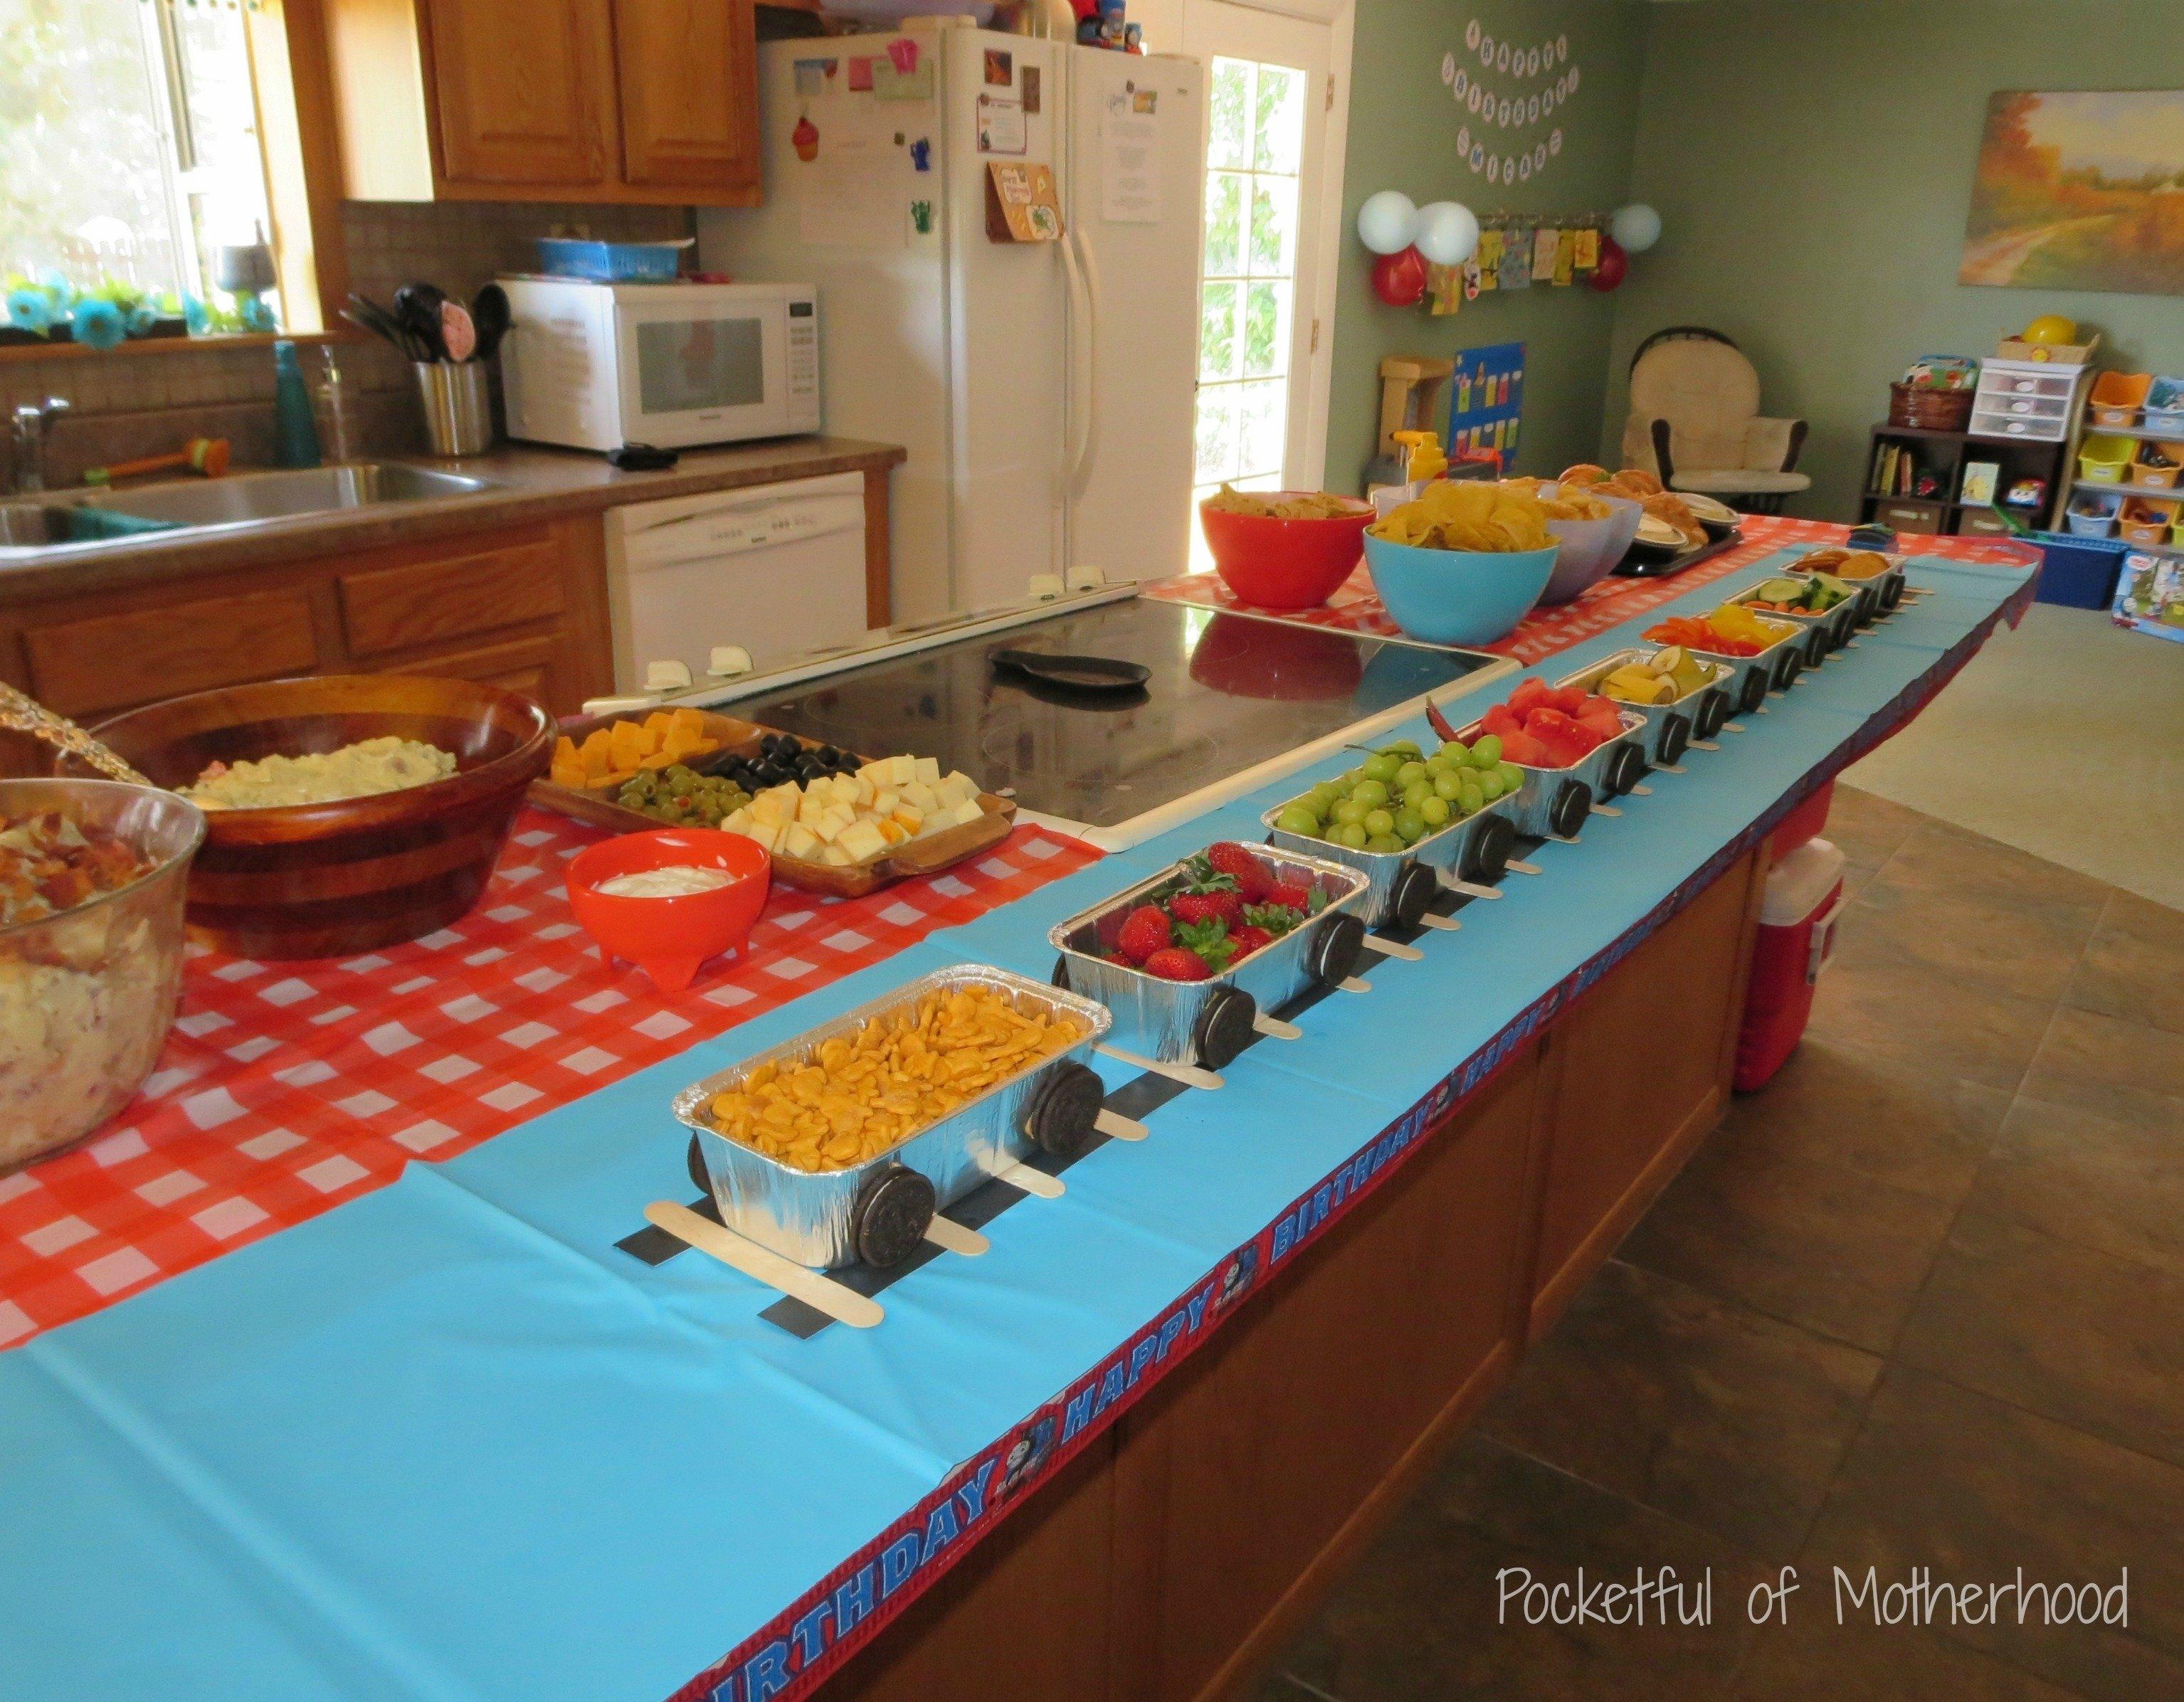 10 Fabulous Thomas The Train Party Food Ideas thomas and friends themed birthday party pocketful of motherhood 2021